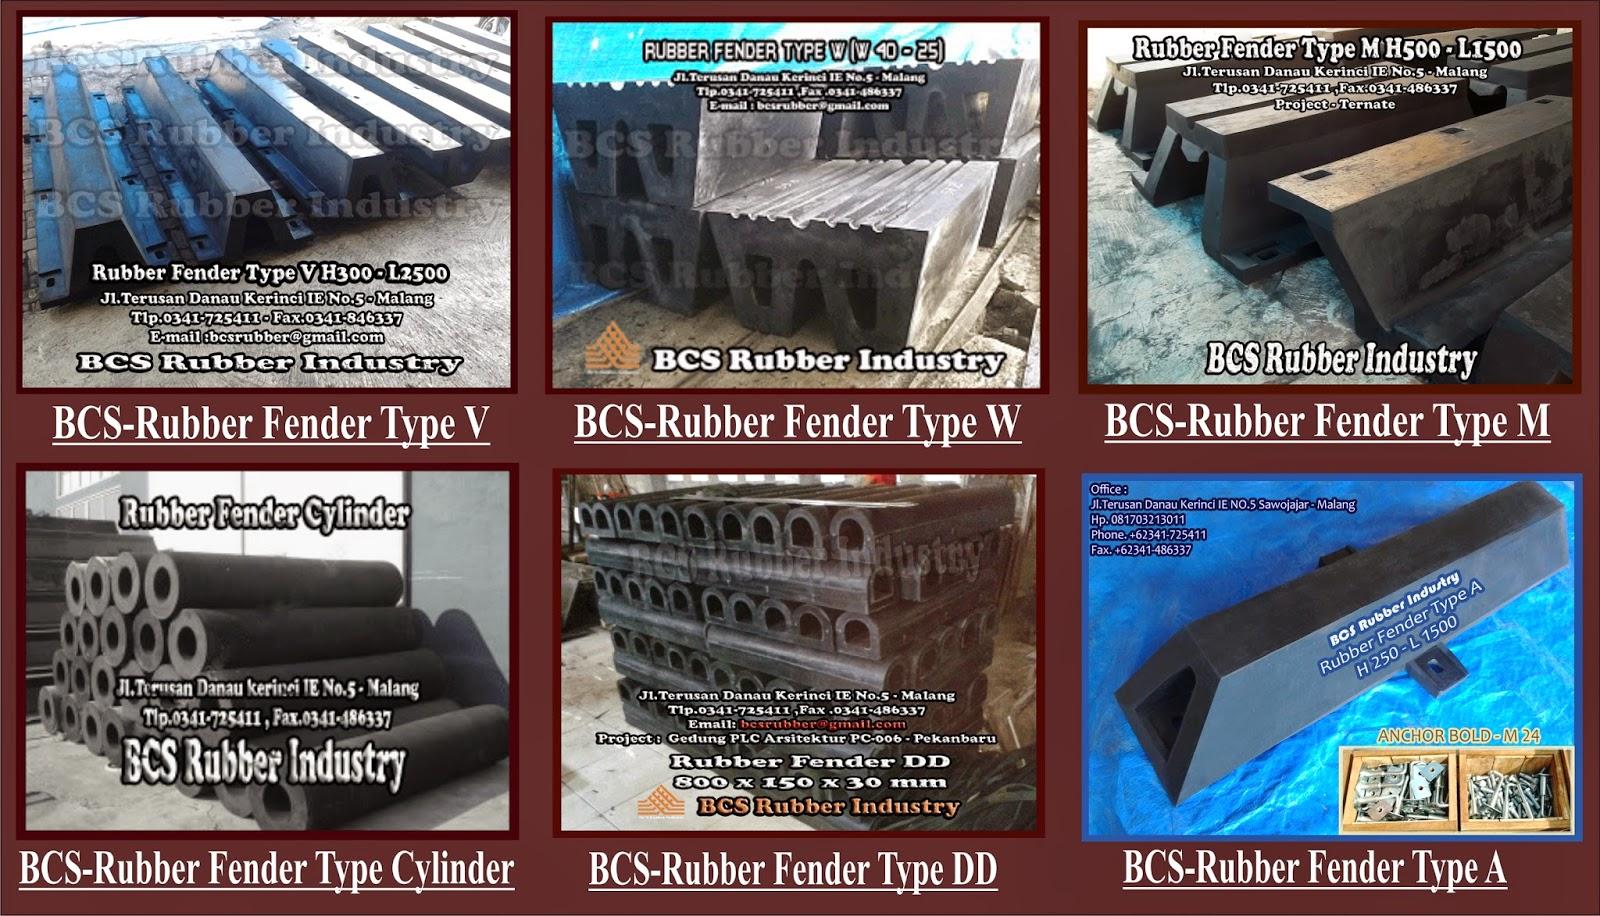 Rubber Fender,Rubber Fender V,Rubber Fender Dermaga,Rubber Fender Type M,Rubber Fender,Jual Rubber Fender,Elastomer Bearing Pads